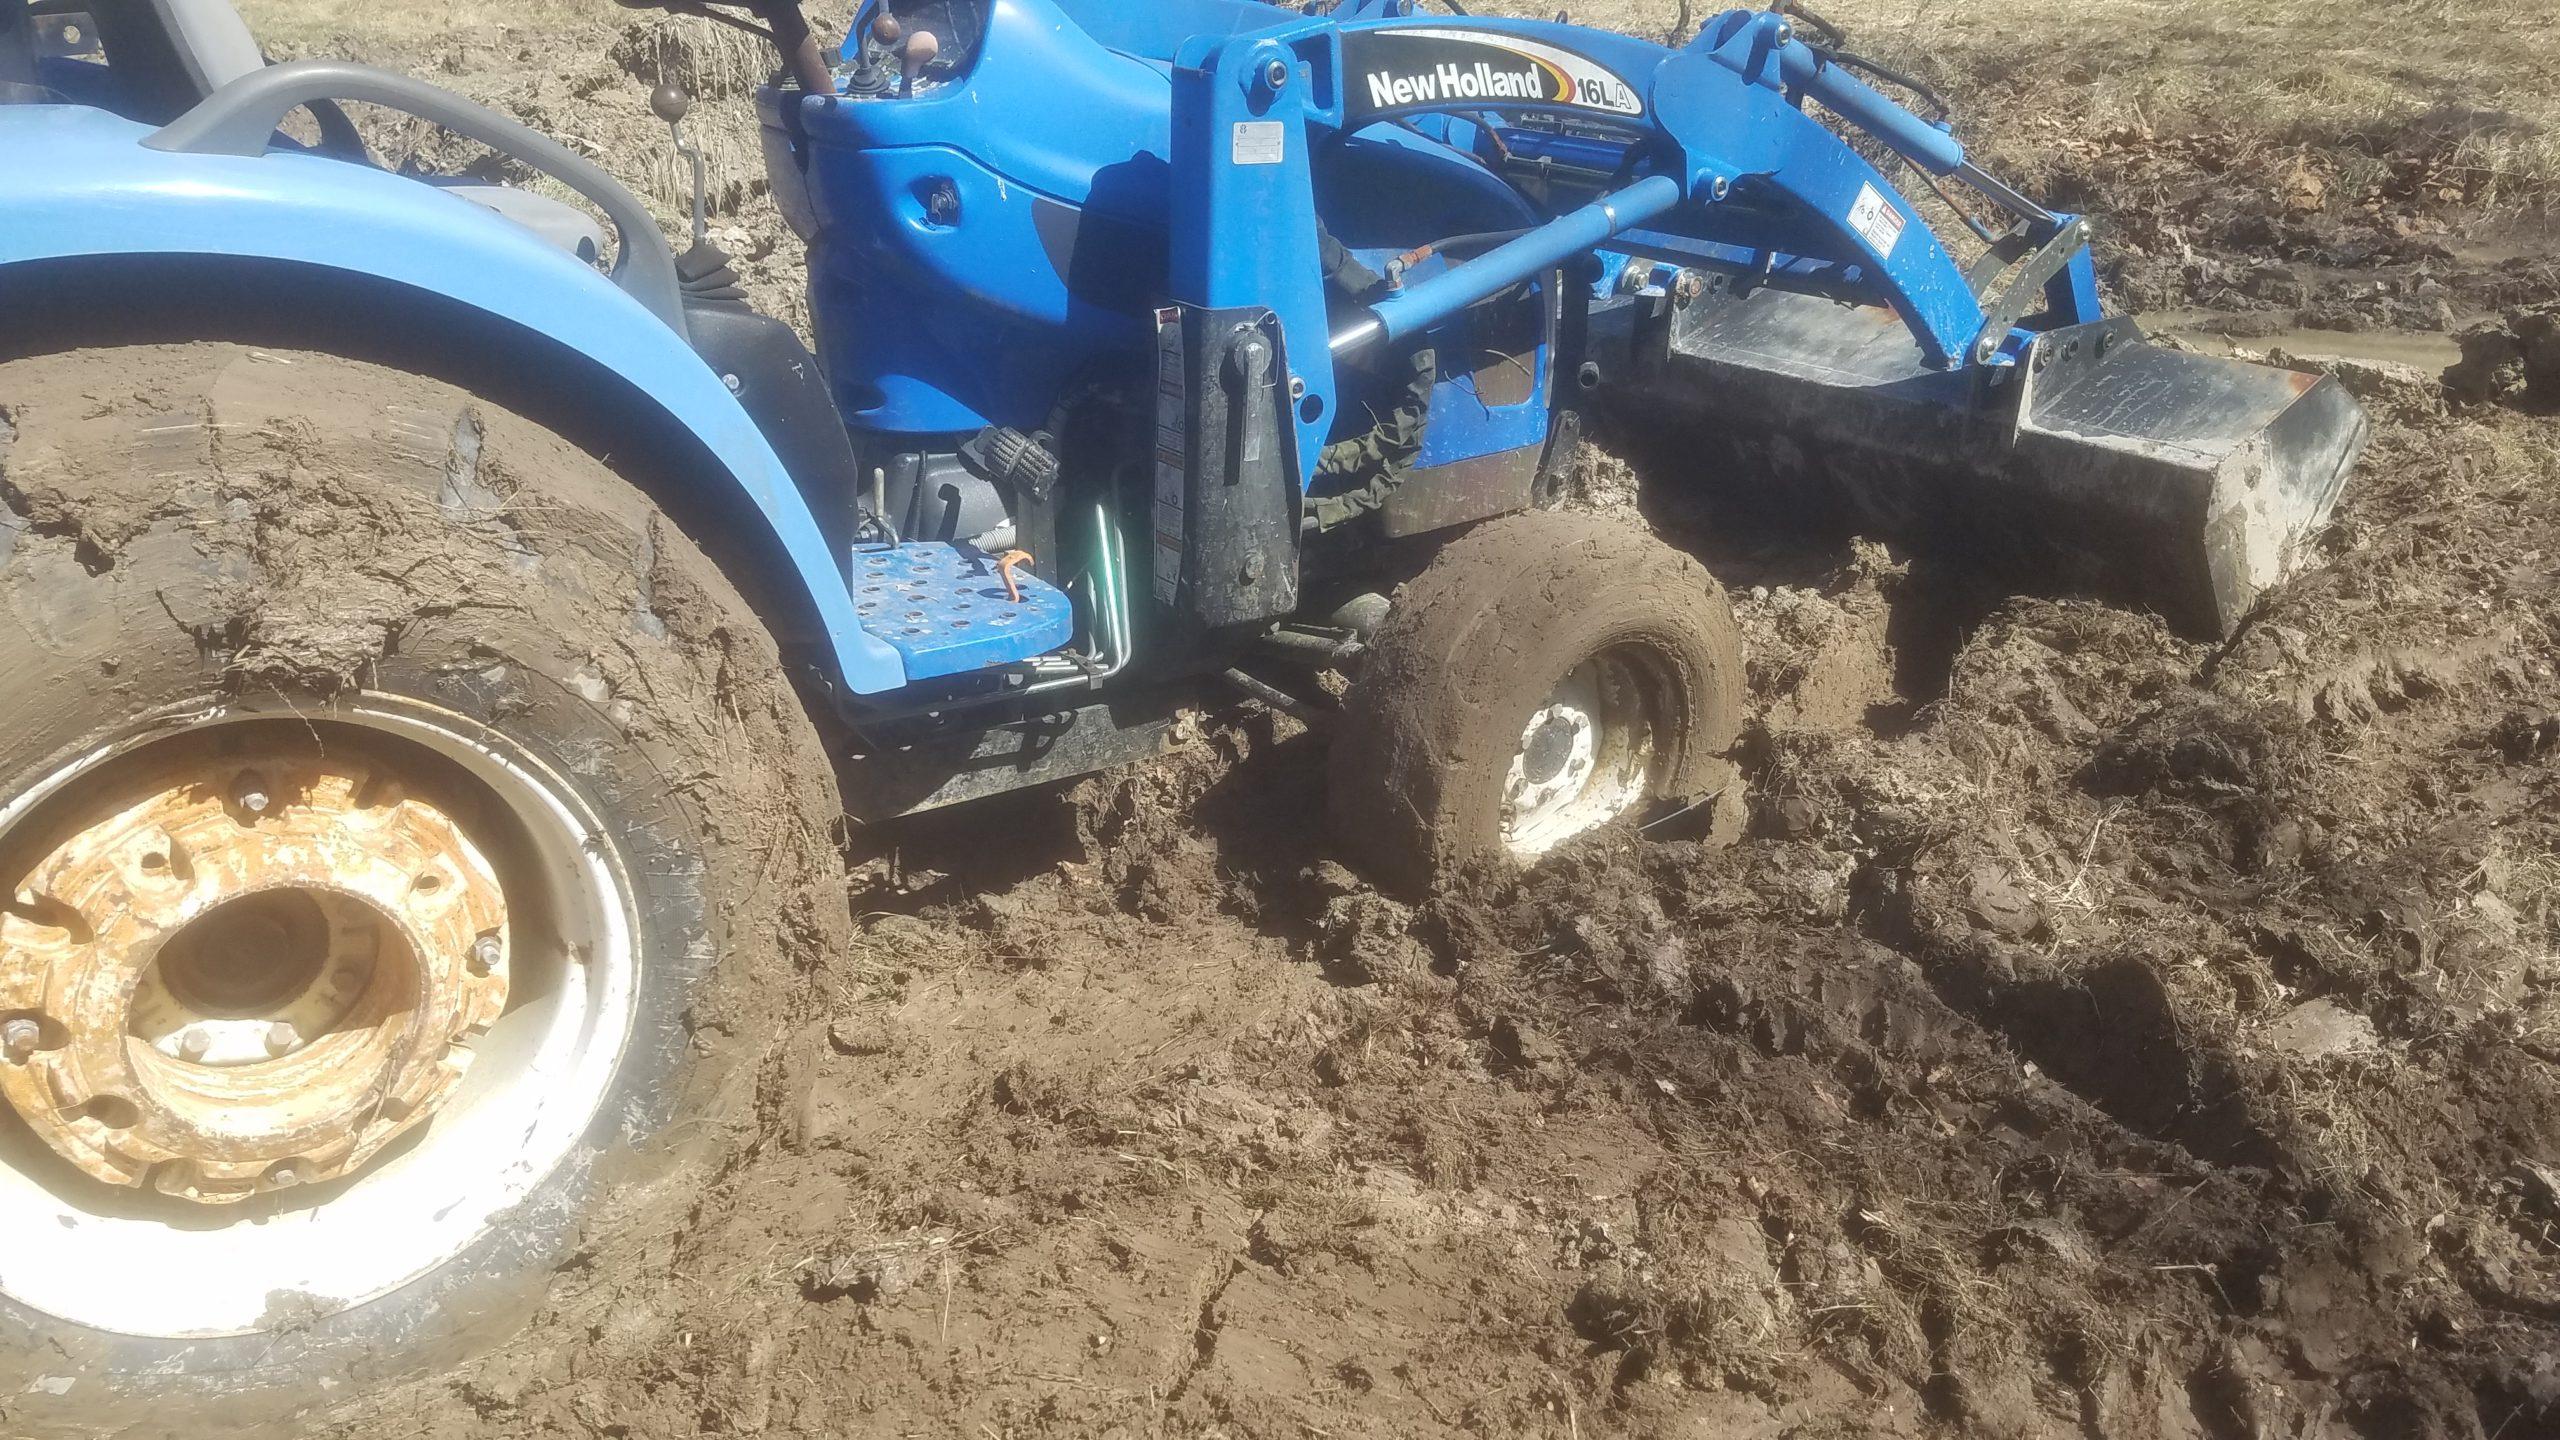 Wayne Davids stuck tractor